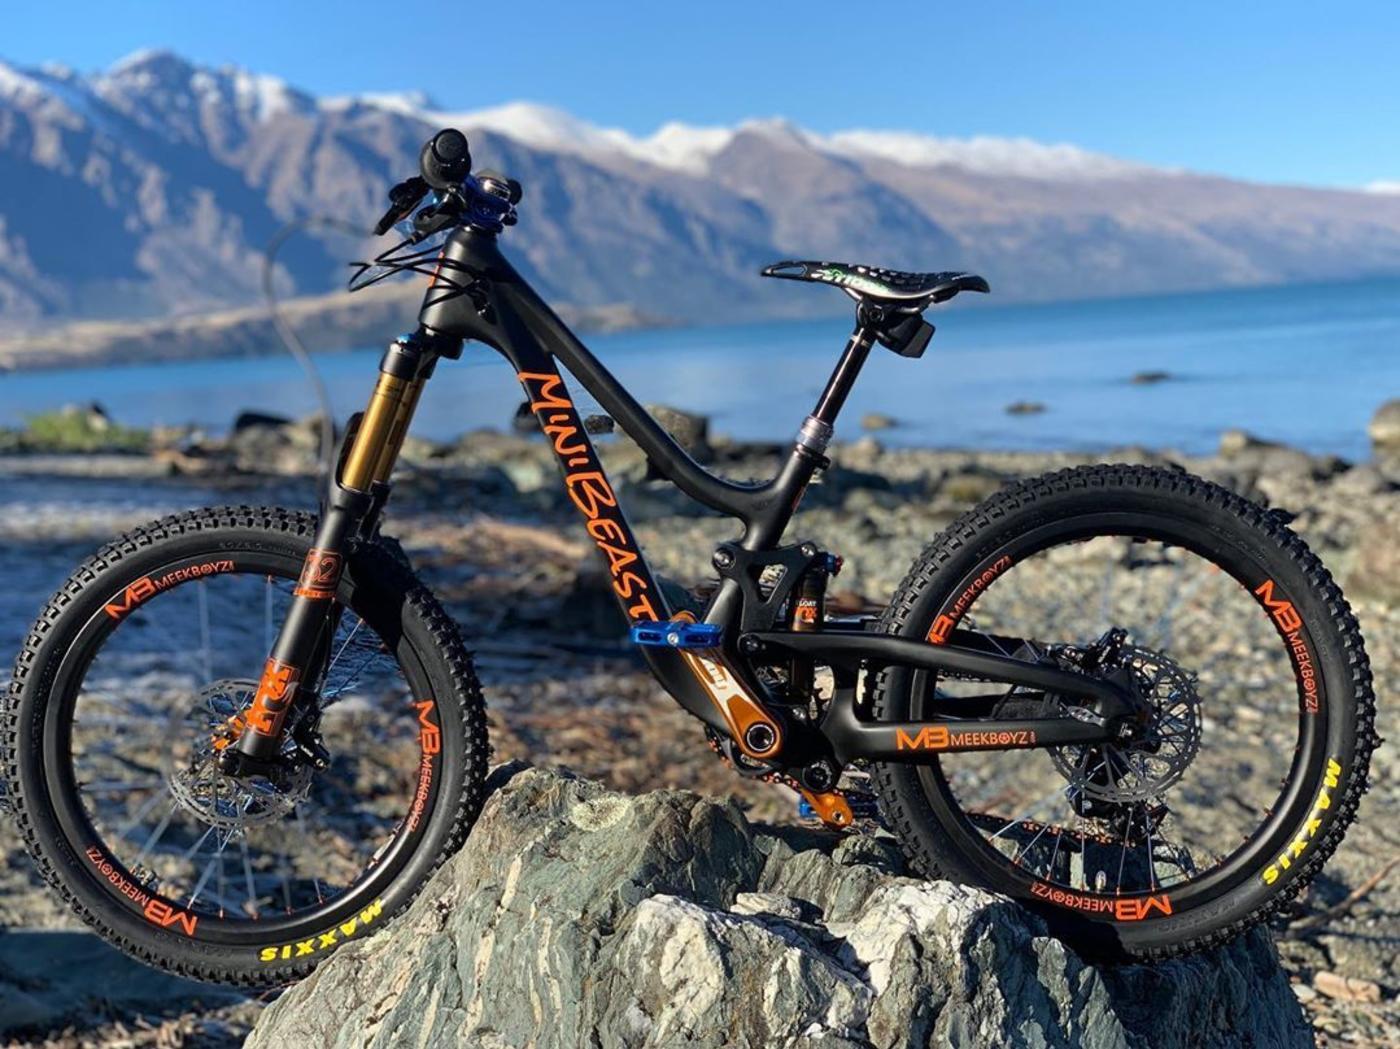 MeekBoyz Youth Downhill Bikes